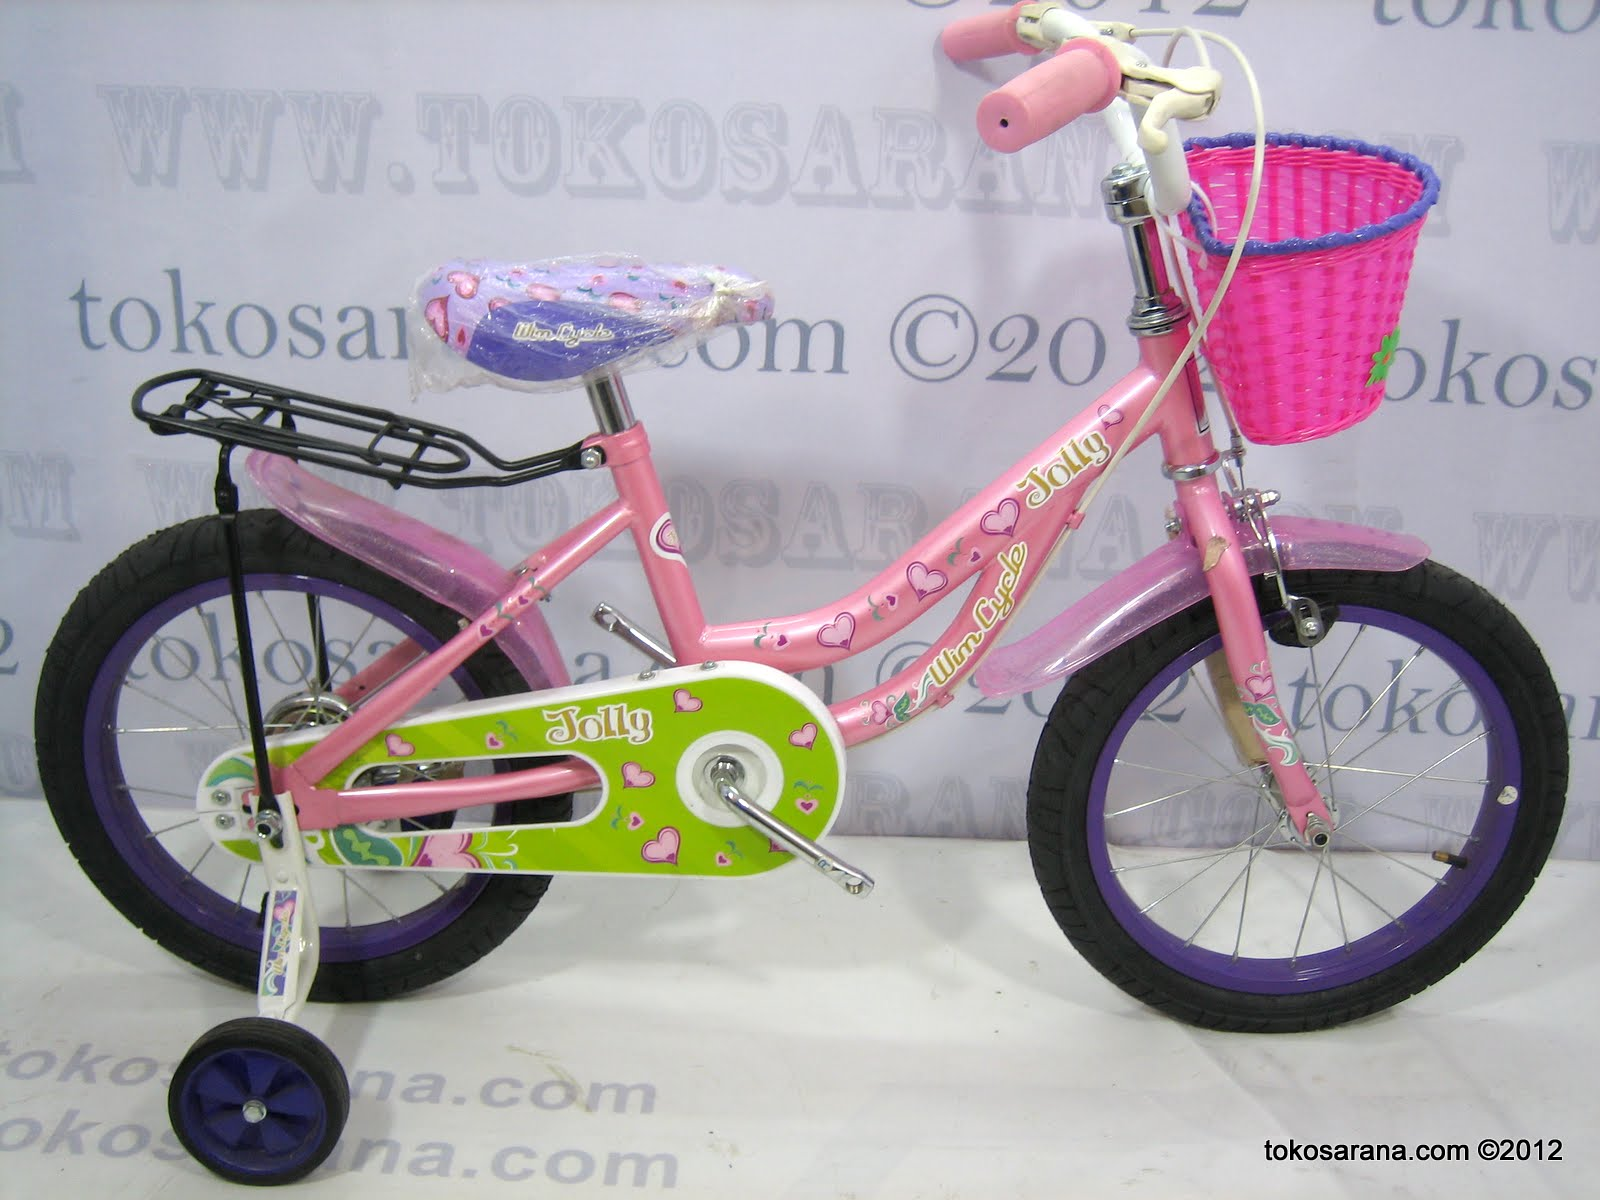 http://4.bp.blogspot.com/-lGB5LJiG3ZI/T2LuPotJKWI/AAAAAAAAPyQ/XvtgHhXSeUA/s1600/16+wimcycle+jolly+special+edition+%25281%2529.JPG